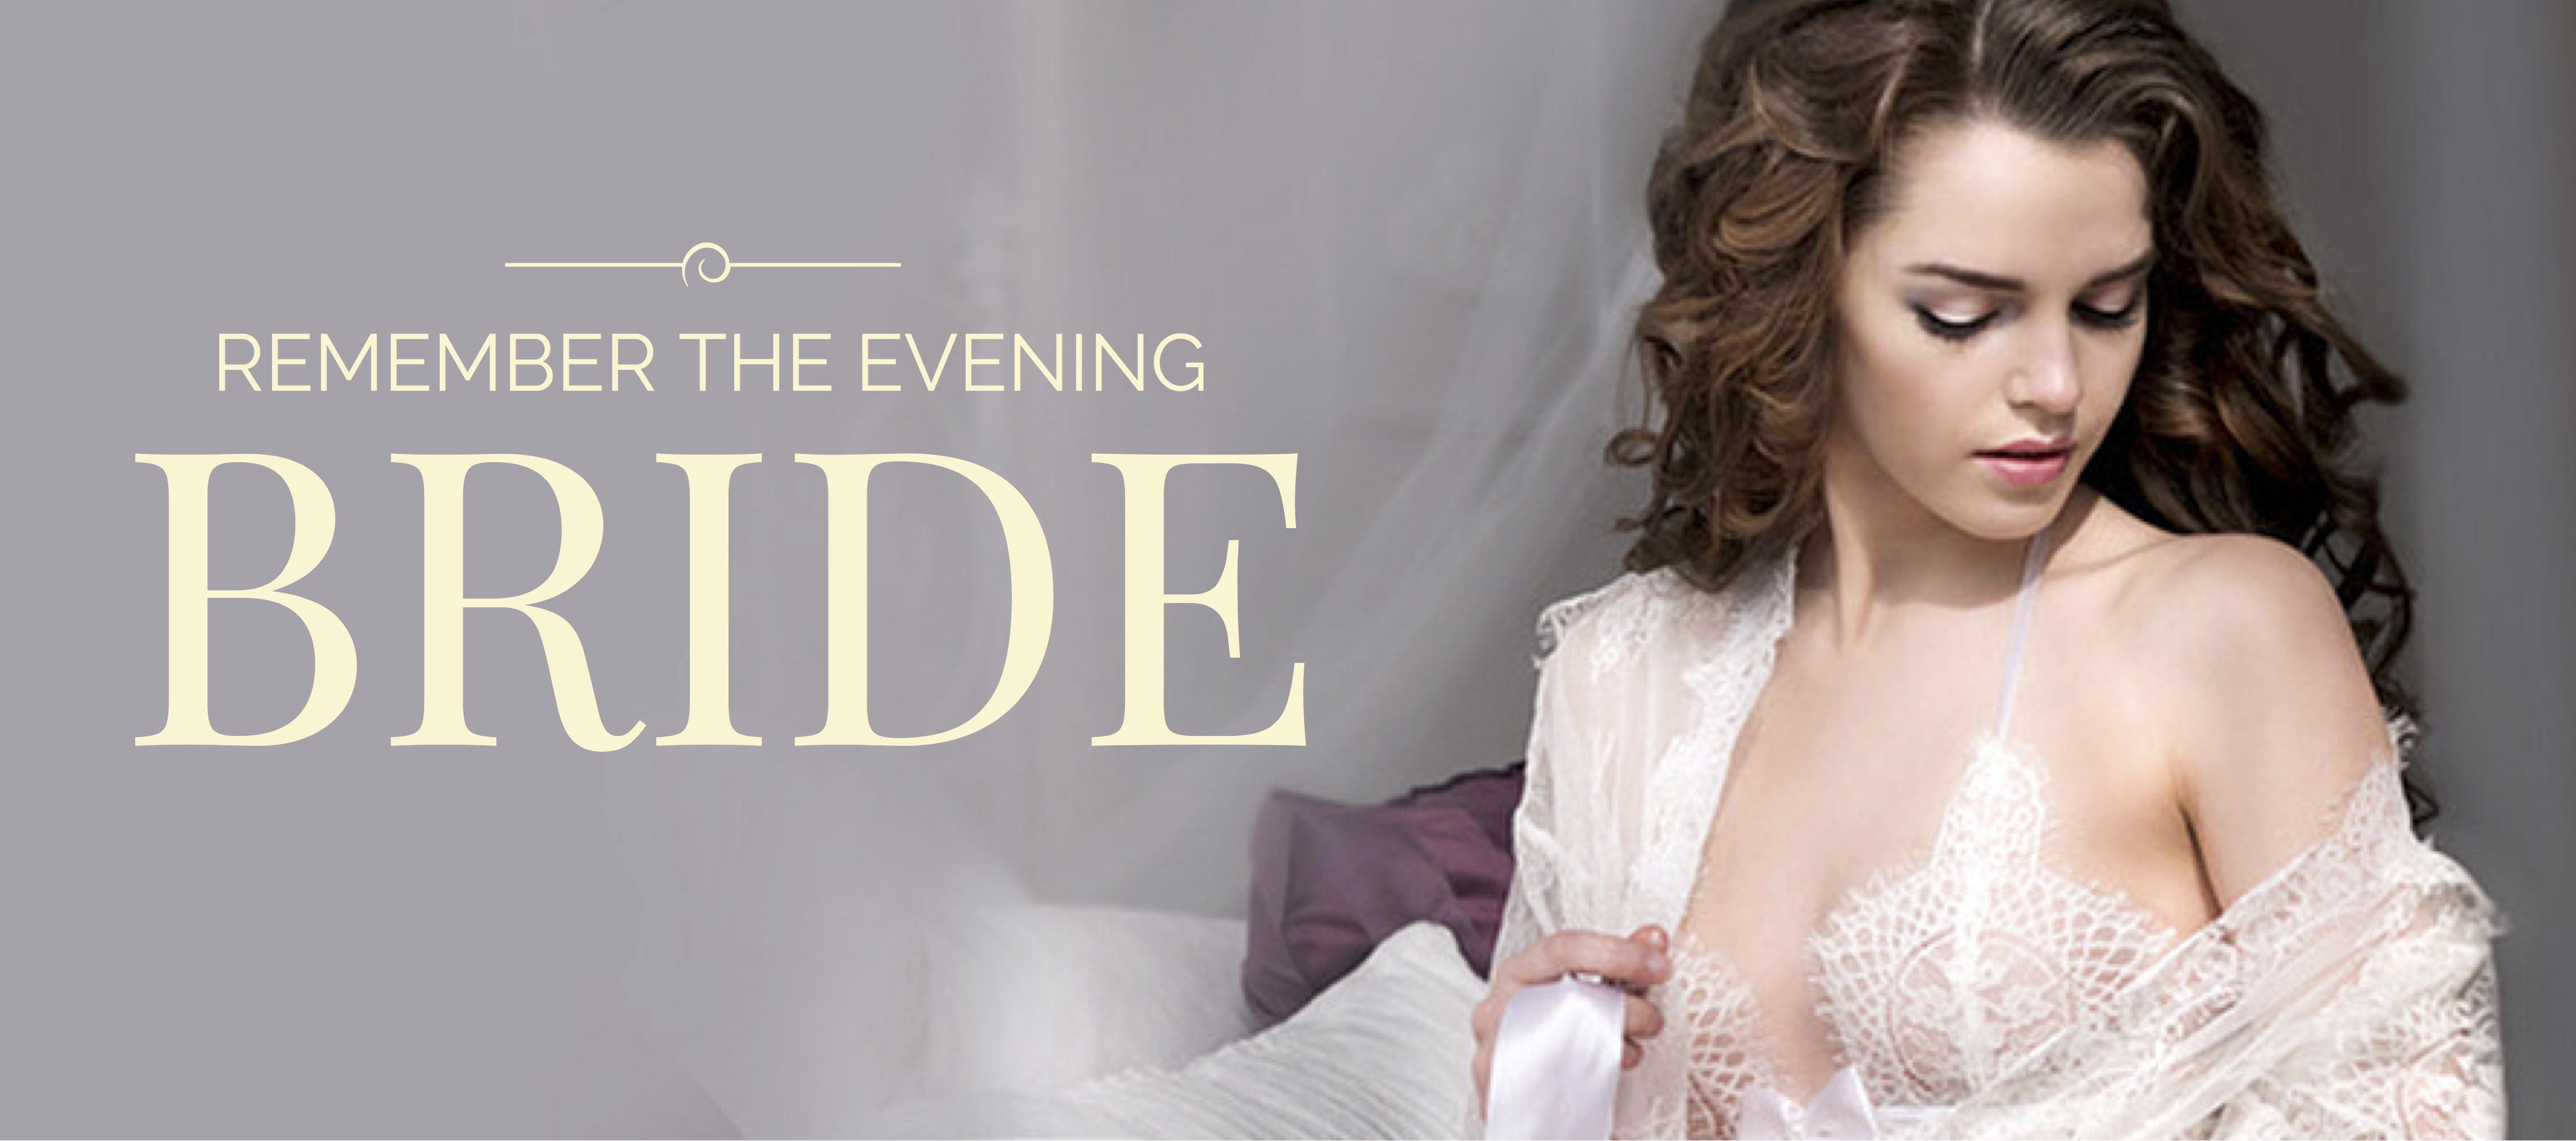 bride-remember-the-evening.jpg